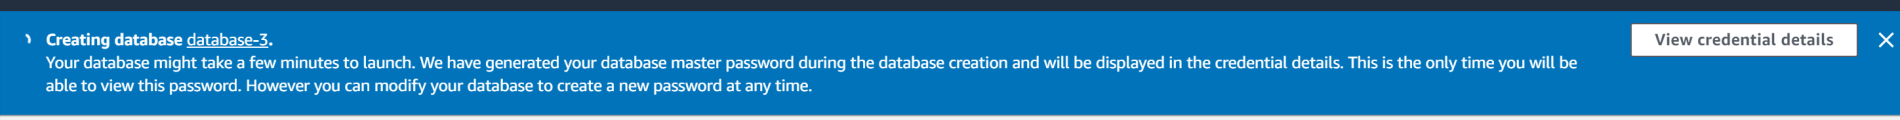 Database creating notice